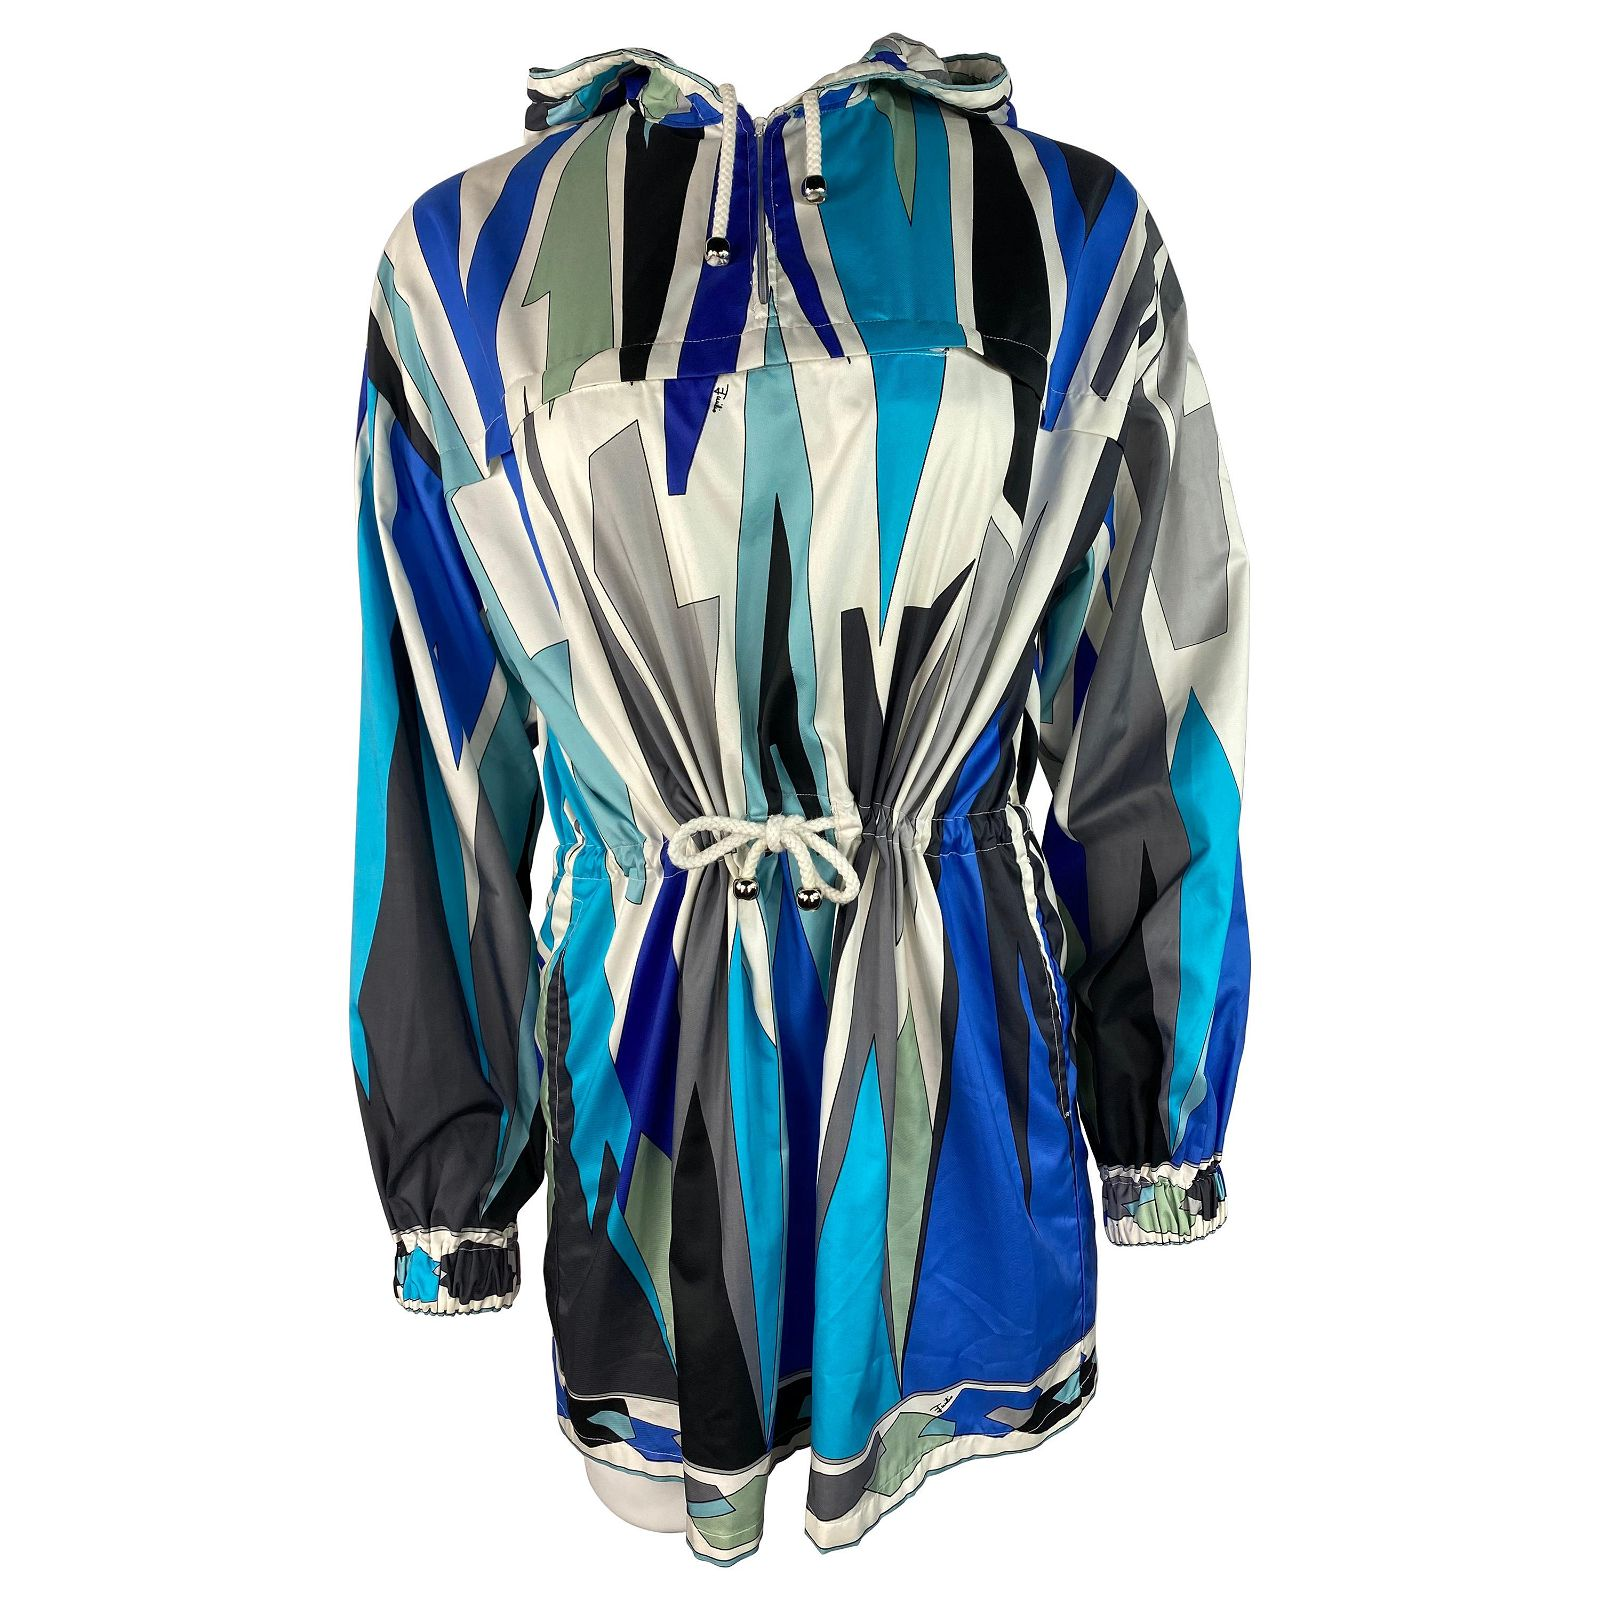 Vintage Emilio Pucci Blue Nylon Wind Parka Jacket, Size